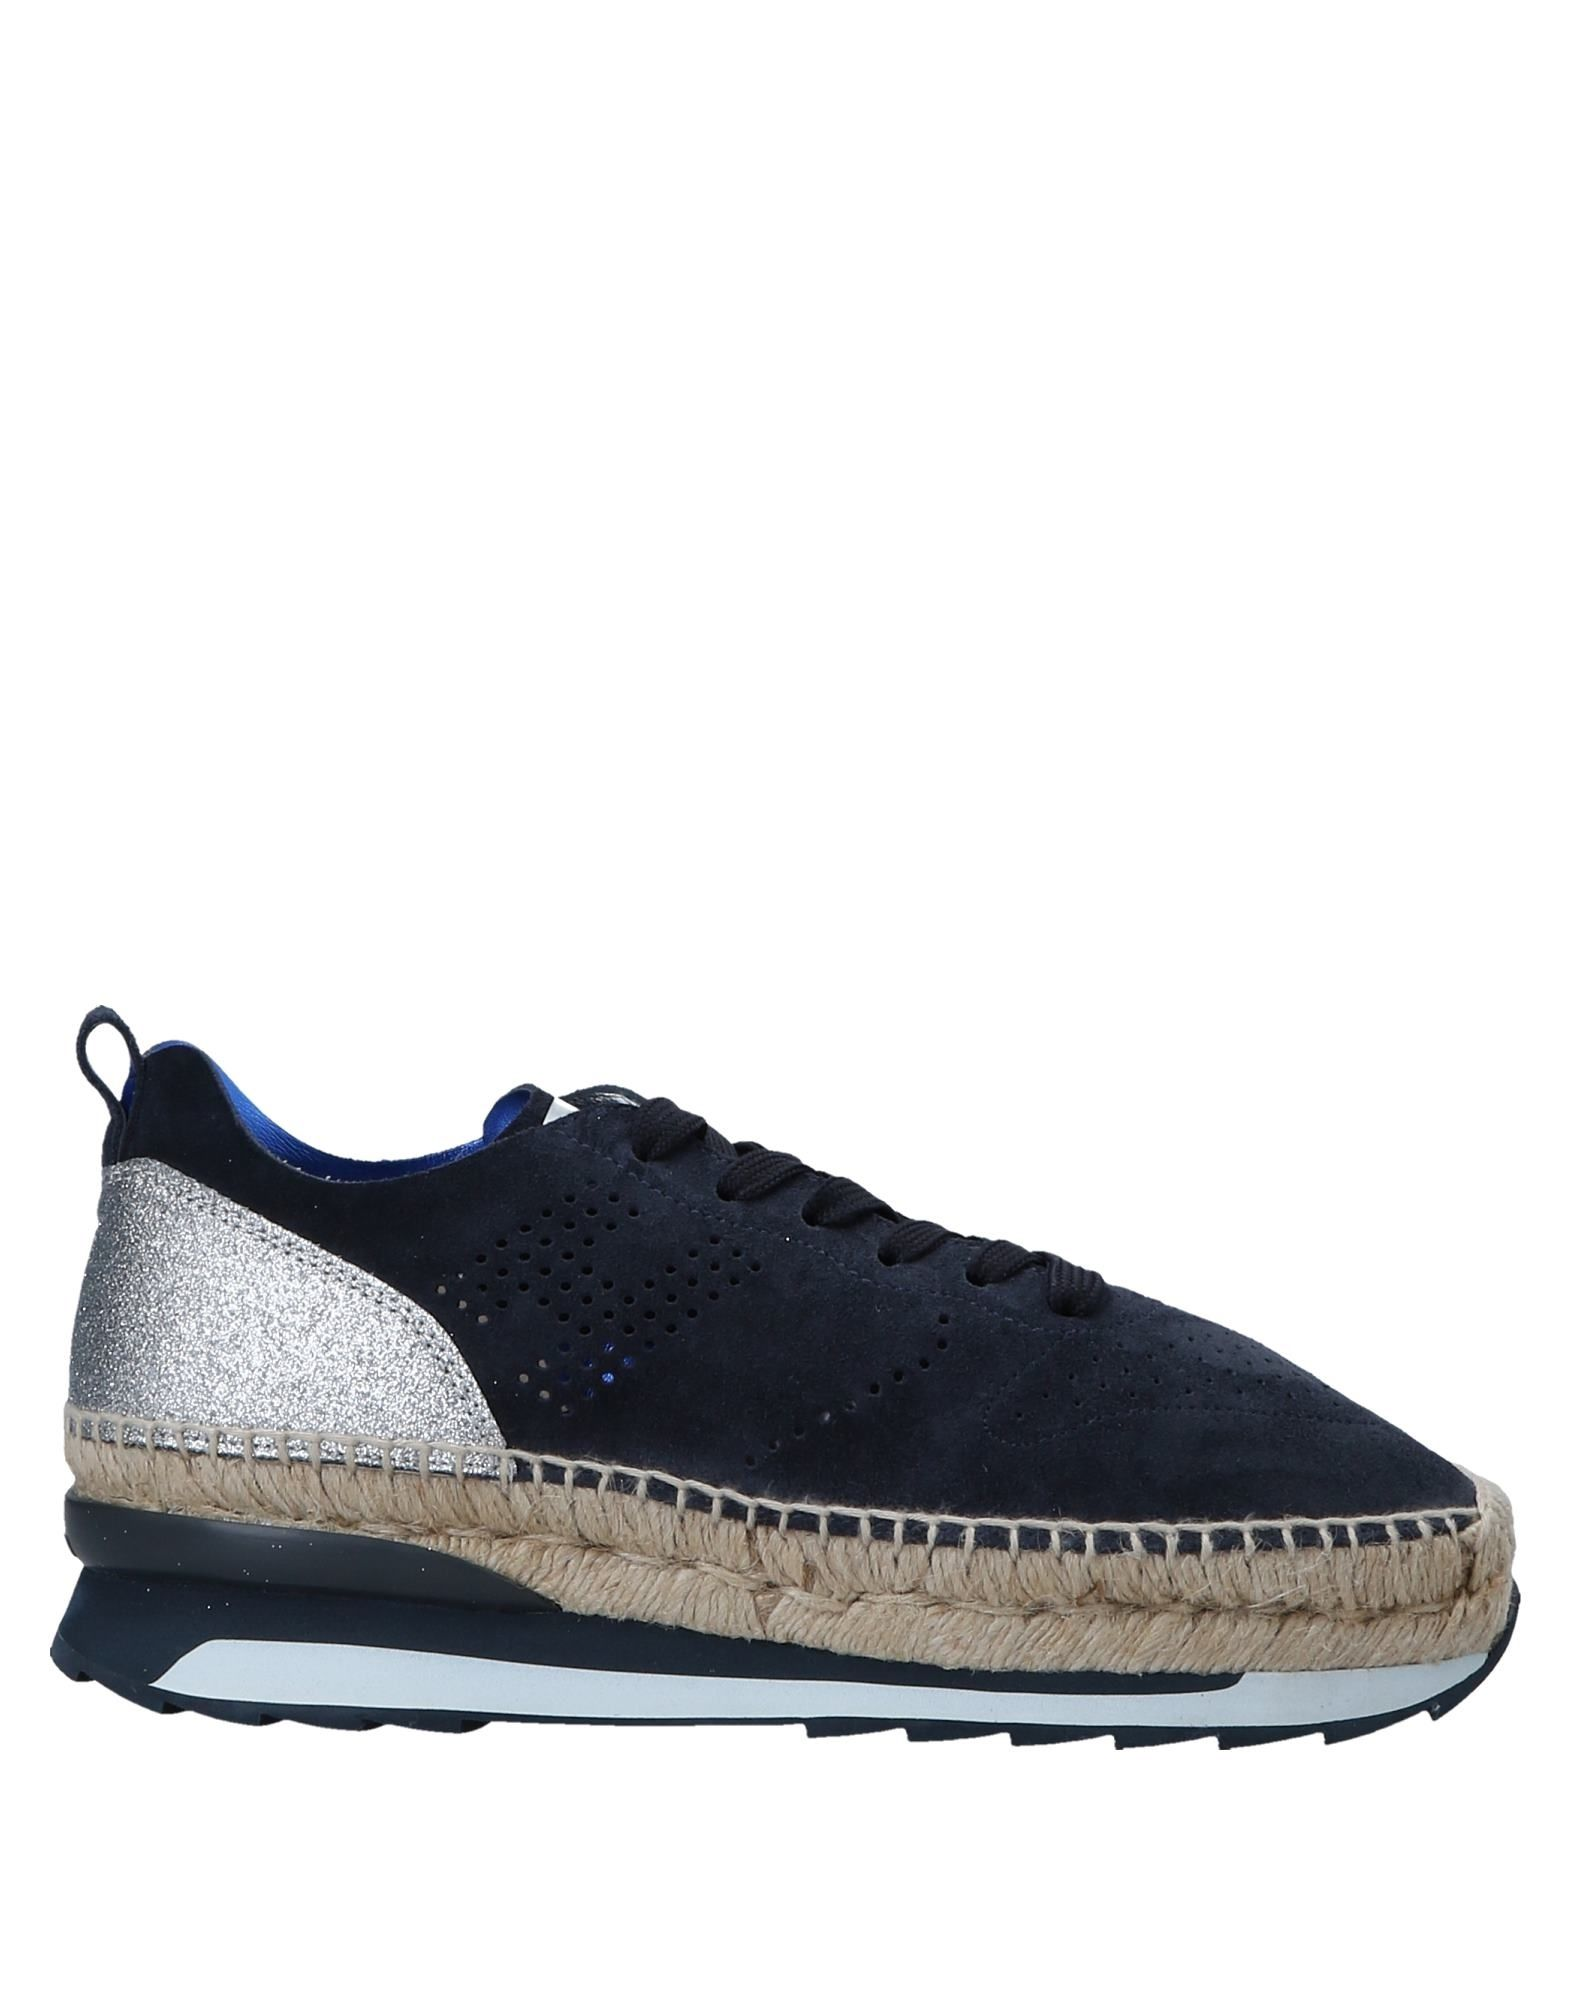 Hogan Rebel Sneakers Damen  11564545GFGut aussehende strapazierfähige Schuhe